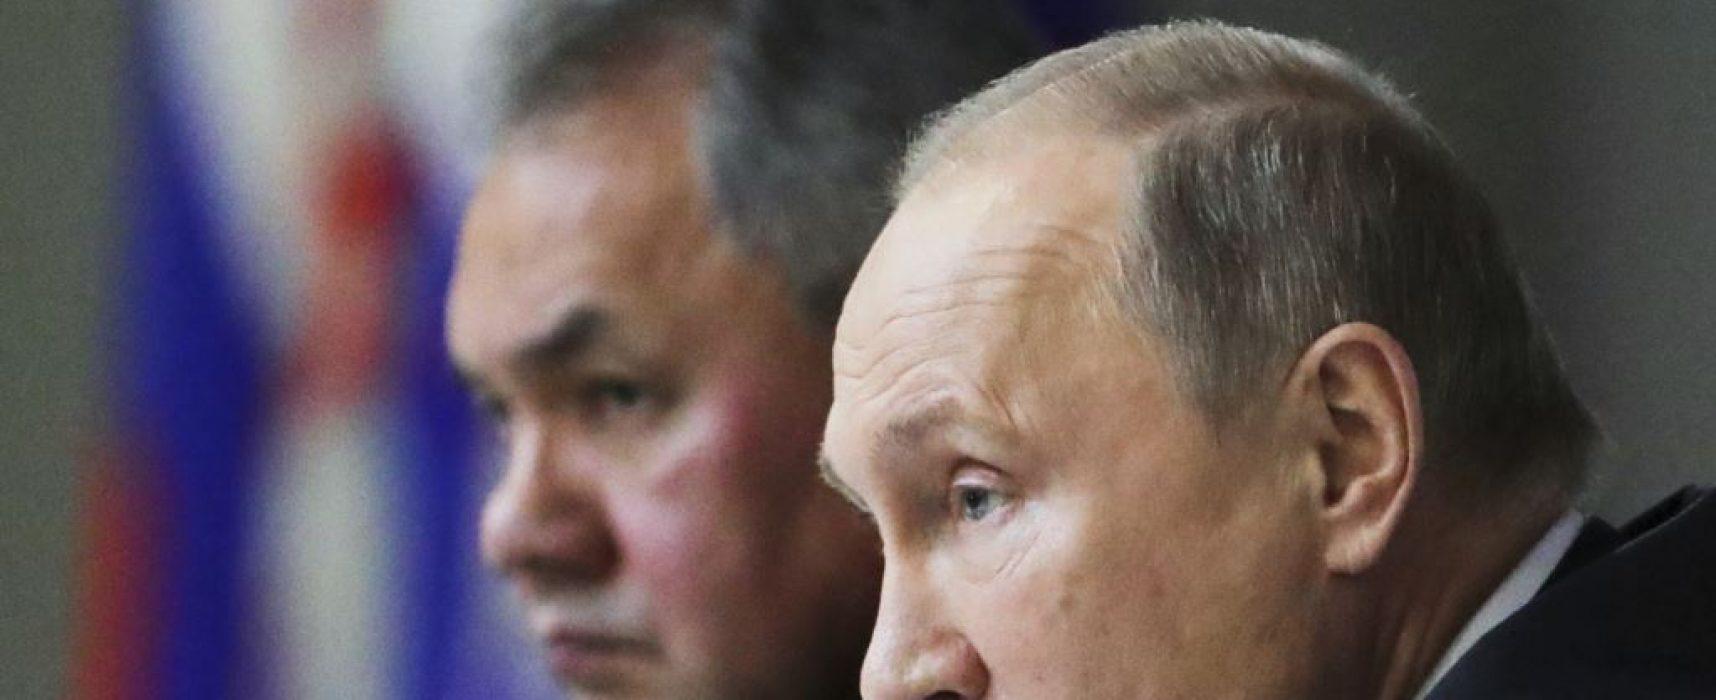 Shoigu: NATO is massing troops along Russia's western borders